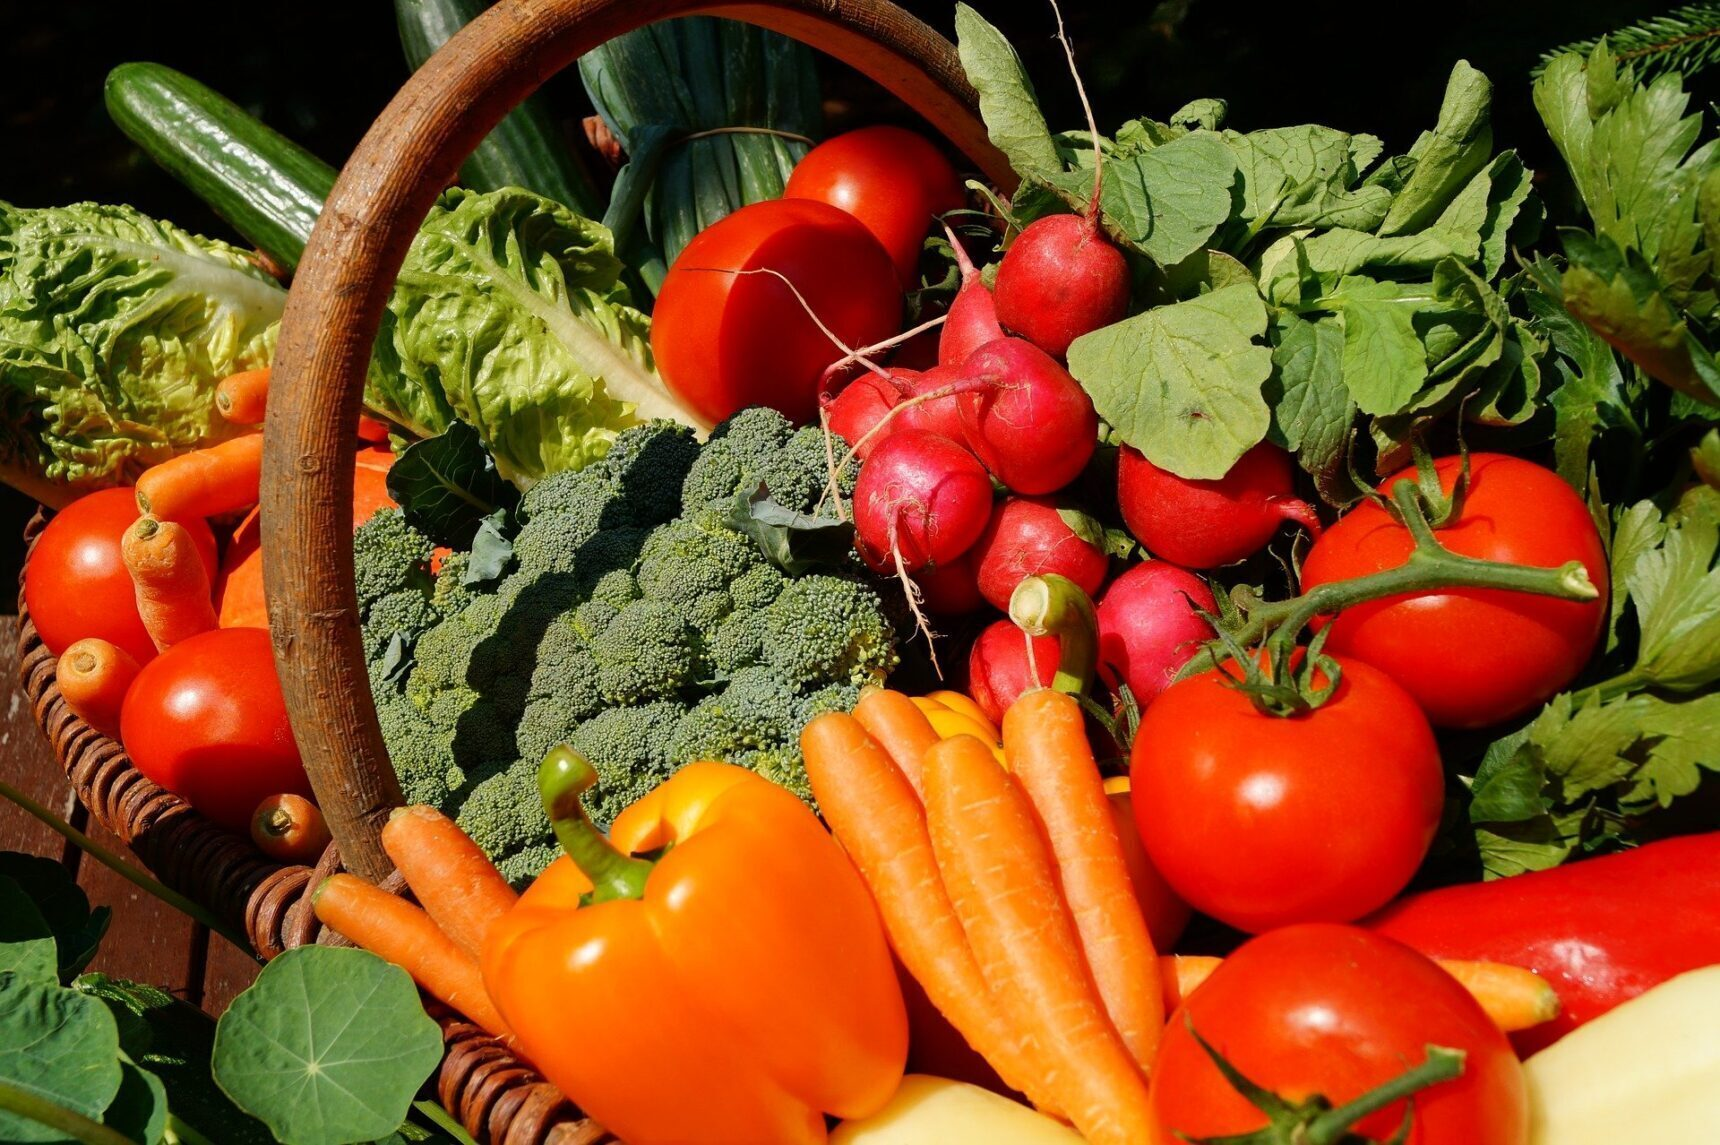 https://www.proinfoandadvice.com/wp-content/uploads/2021/02/vegetables-3386212_1920-1-e1619618138562.jpg